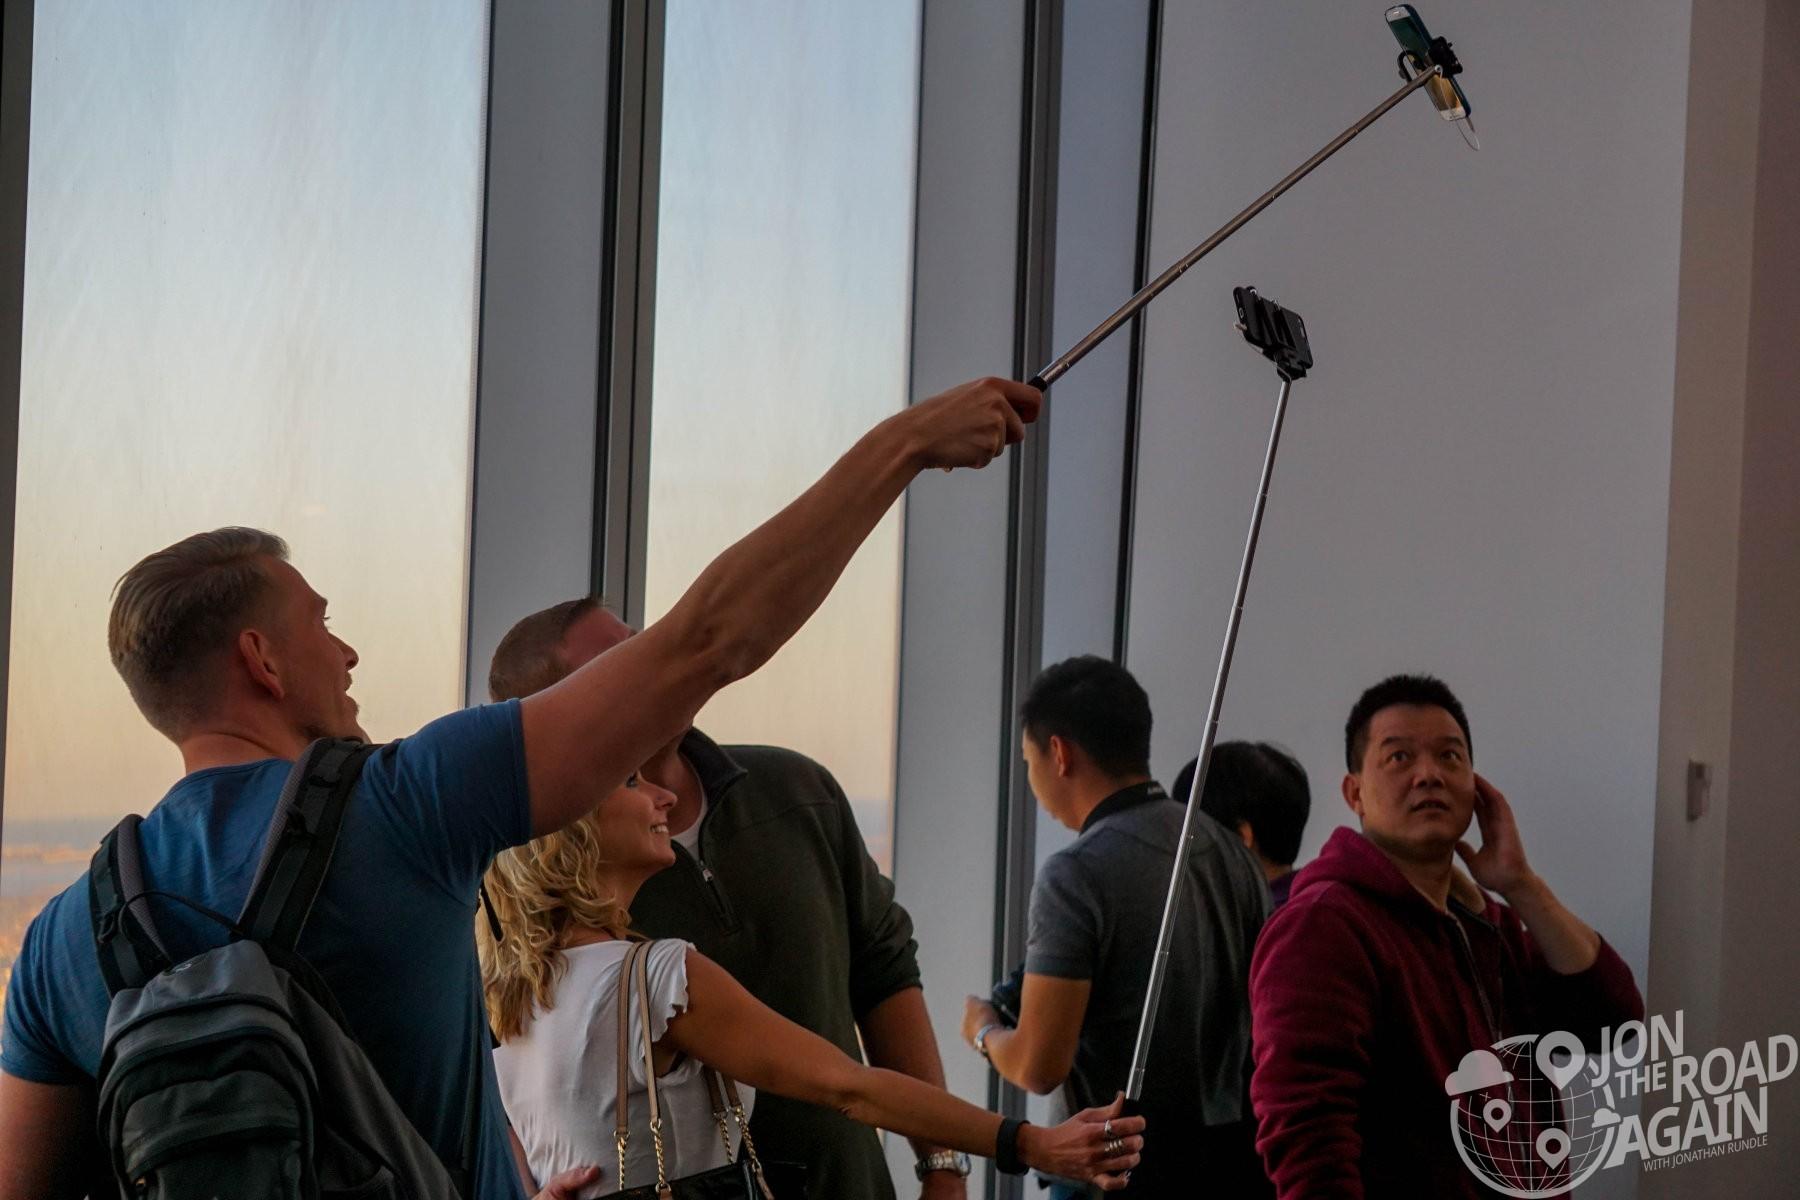 Selfie Sticks at One World Observatory